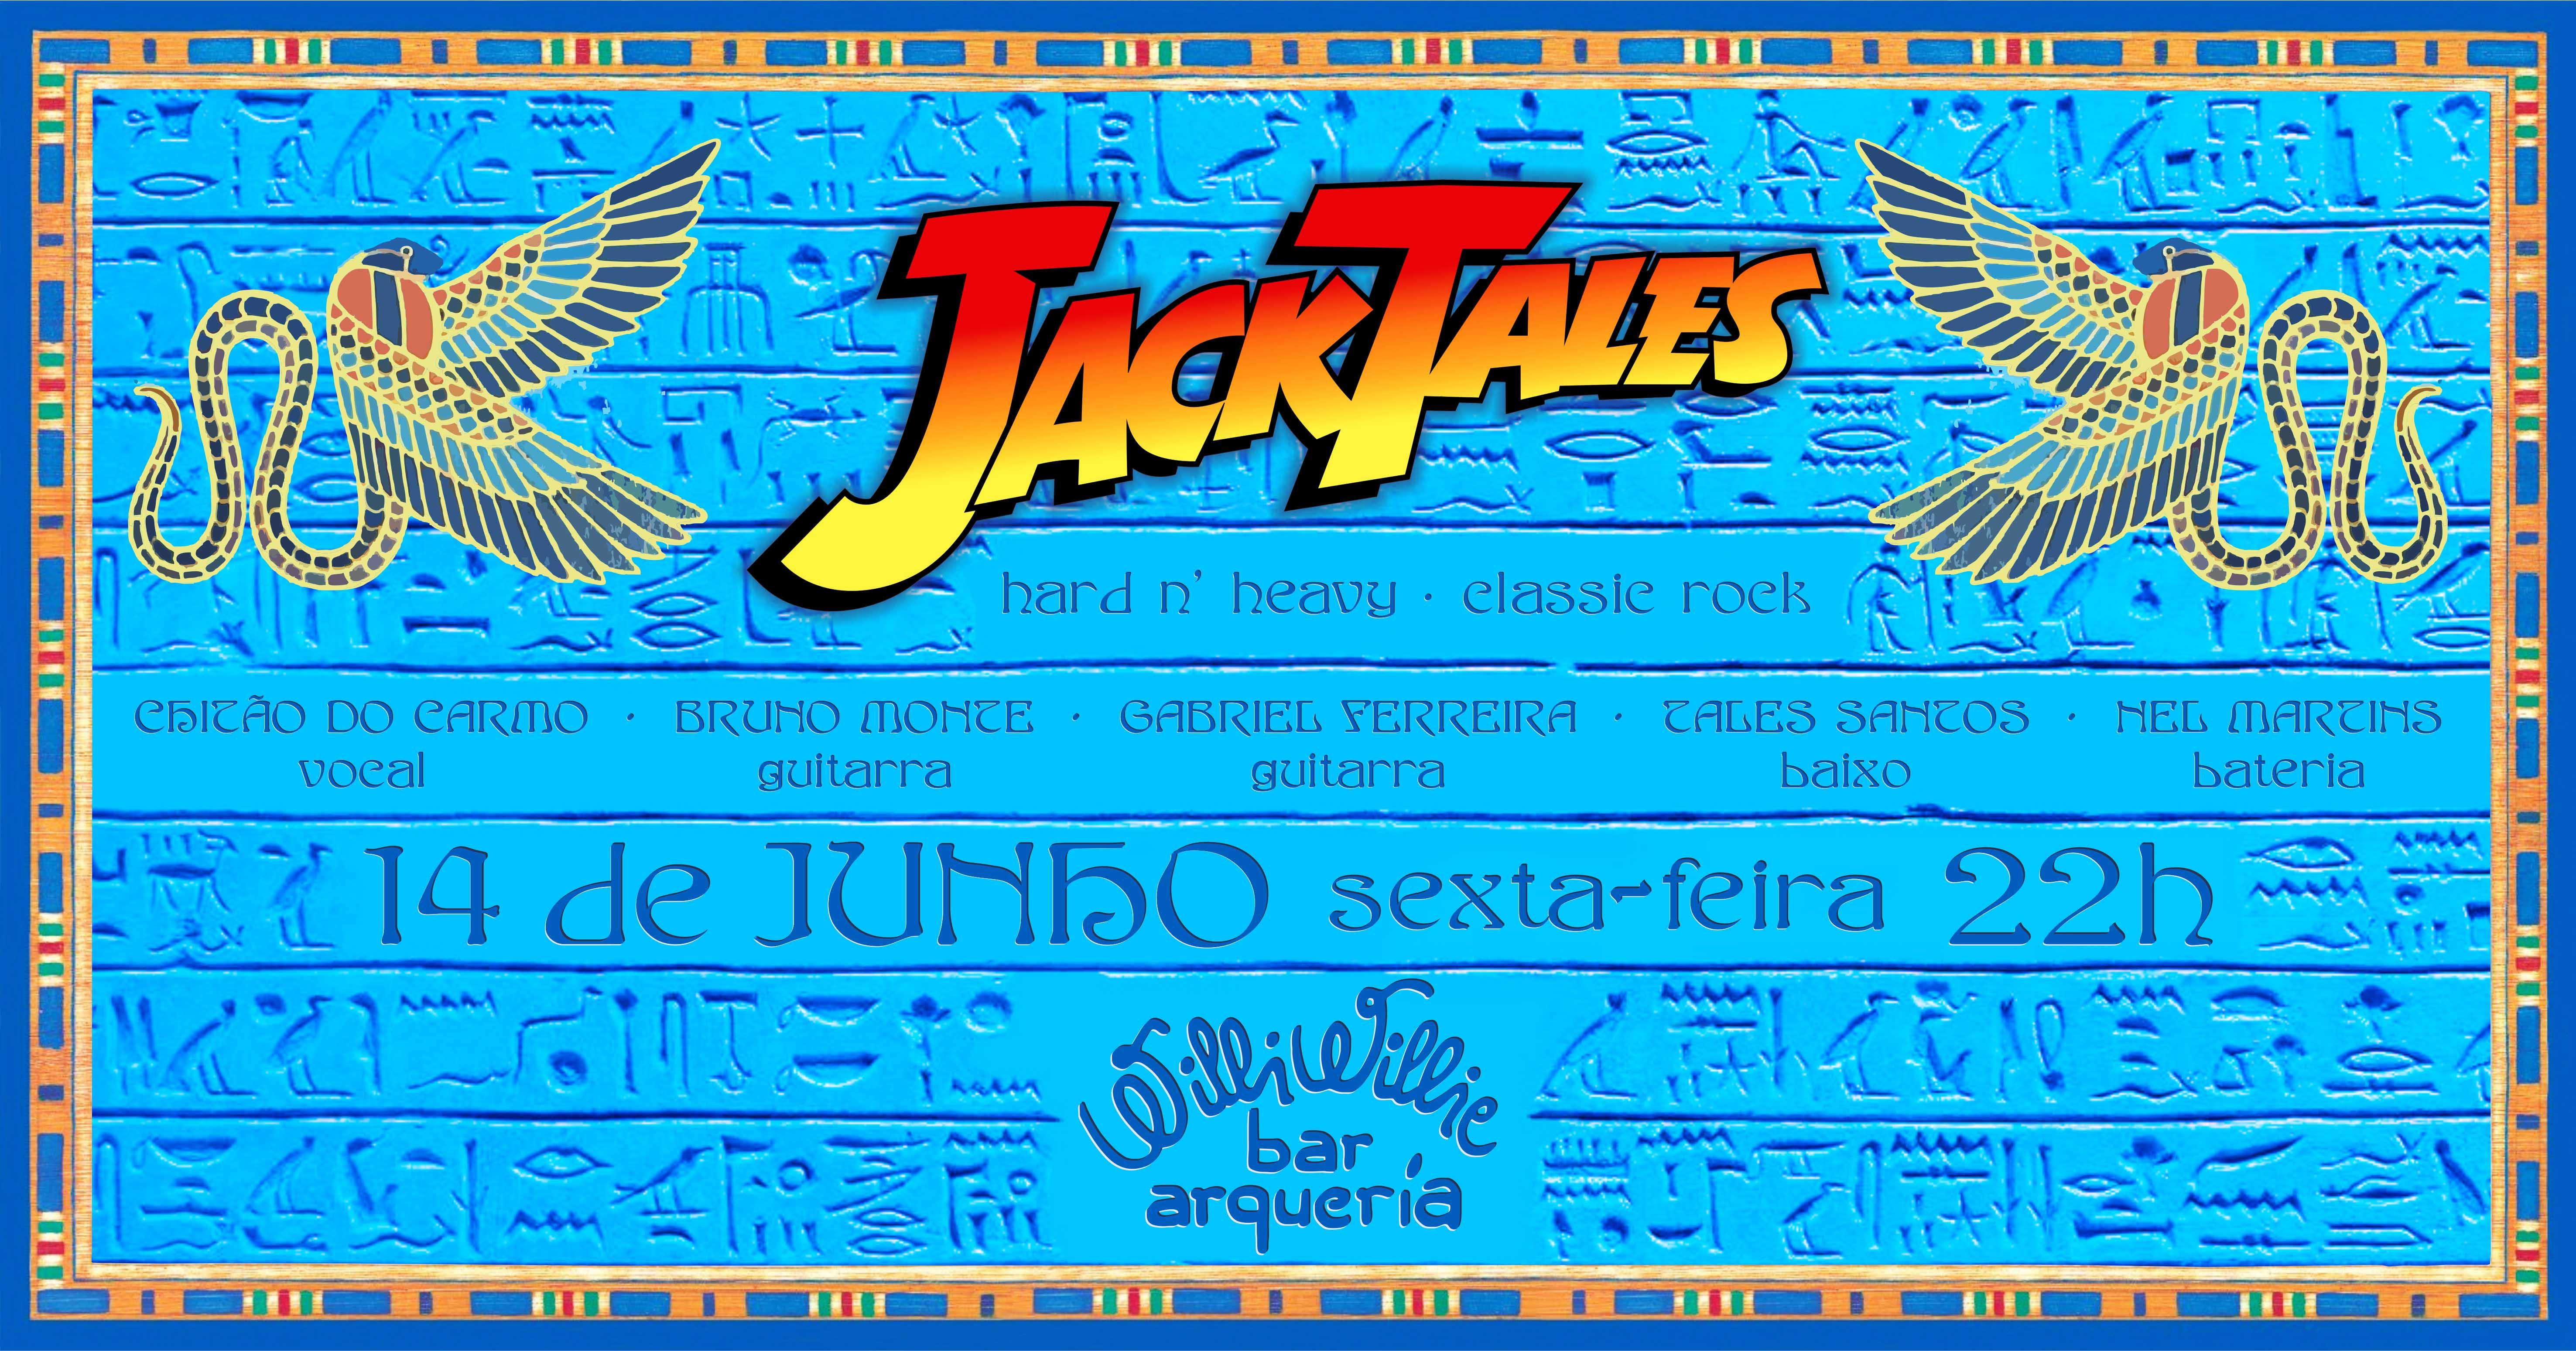 Programação - Jack Tales Band (Hard/Classic Rock)